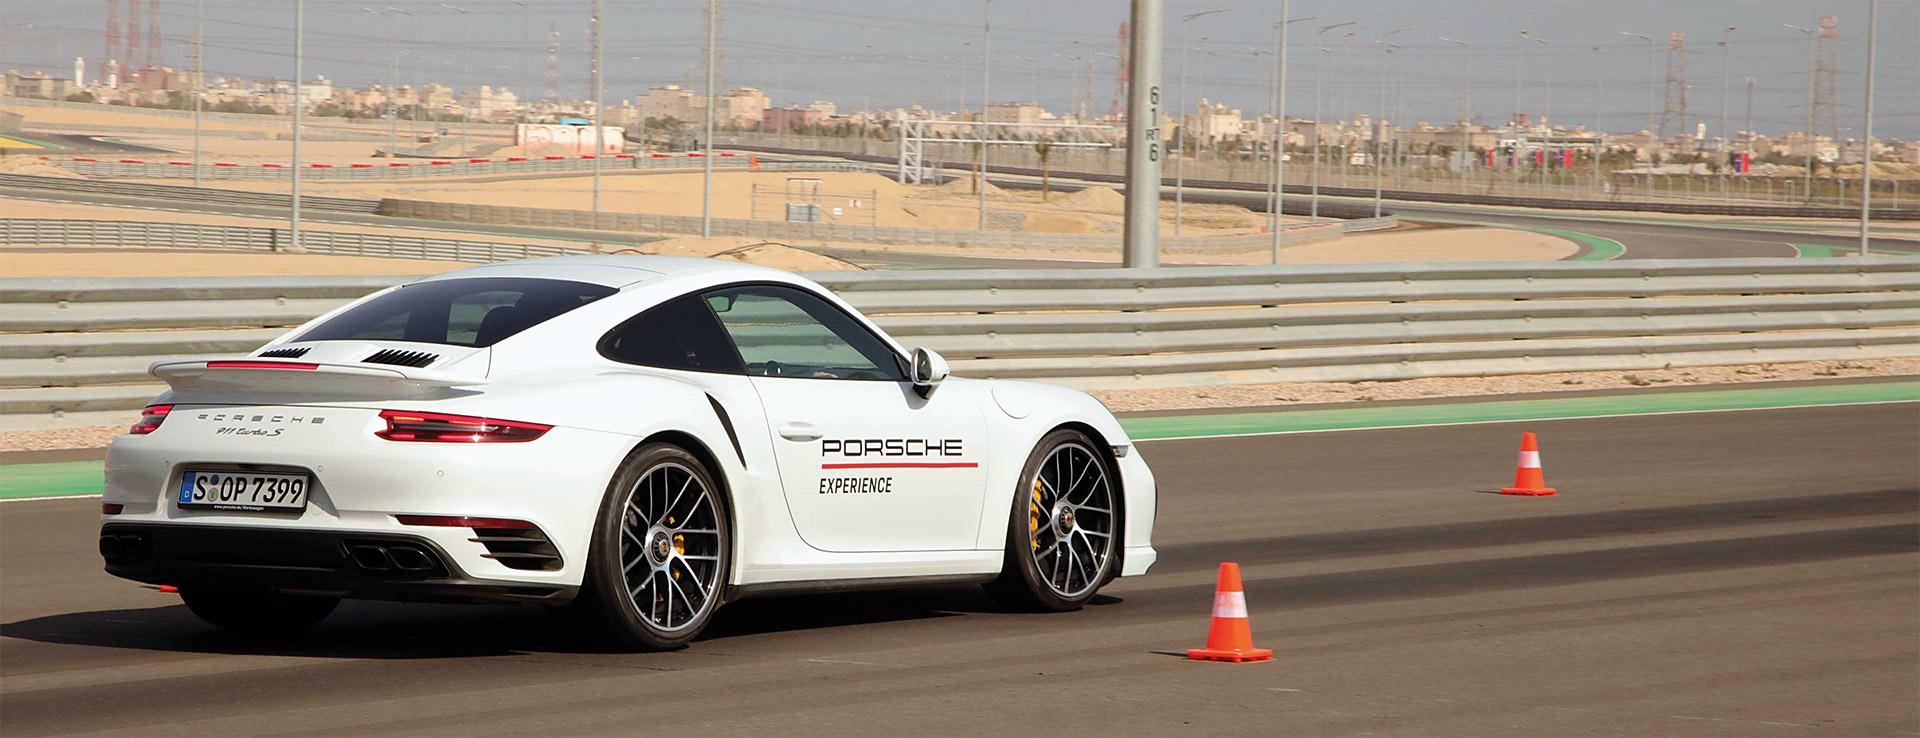 Porsche takes the racetrack in Kuwait.